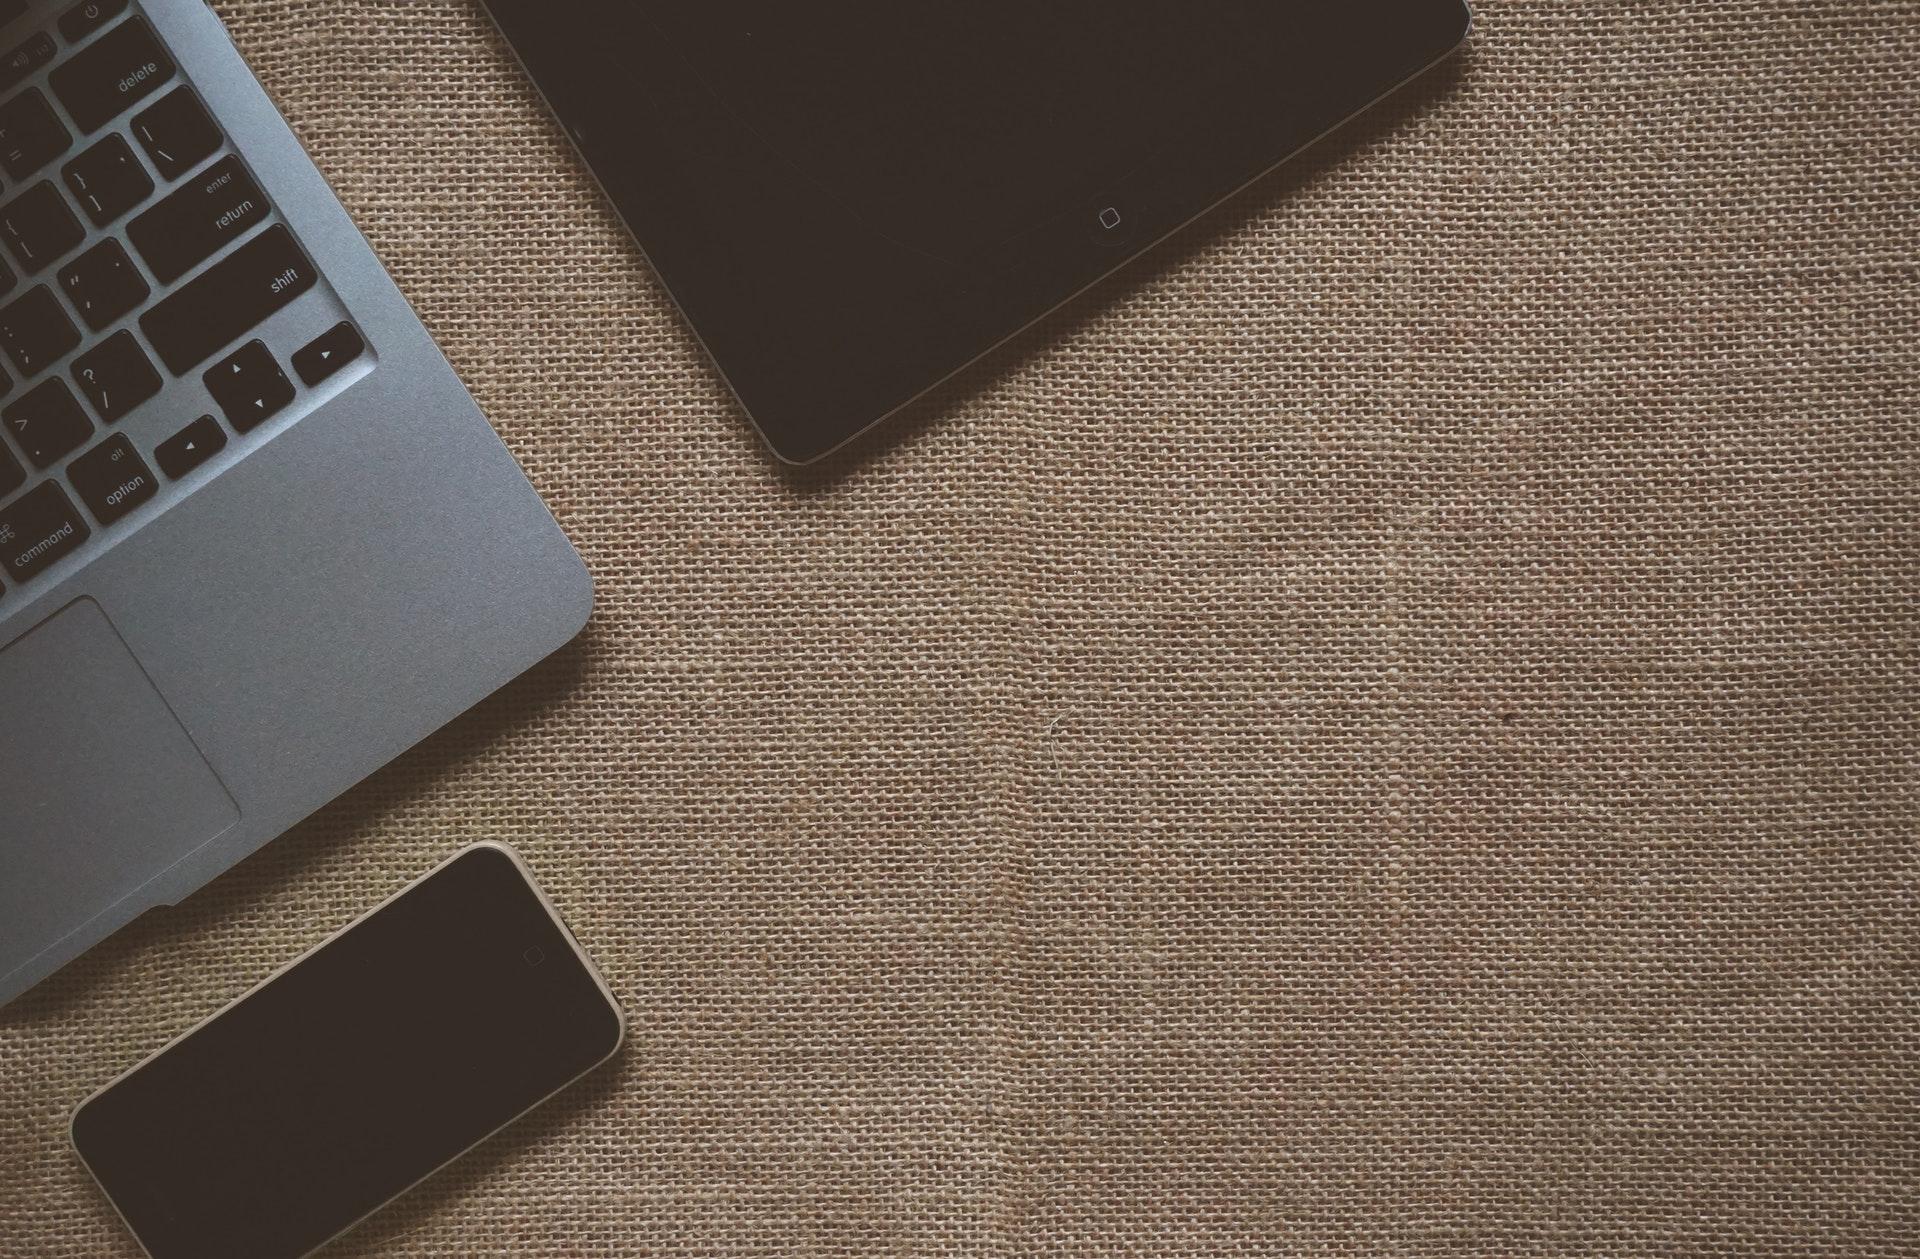 Electronic devices, Austin Texas Web Developer Web Designer